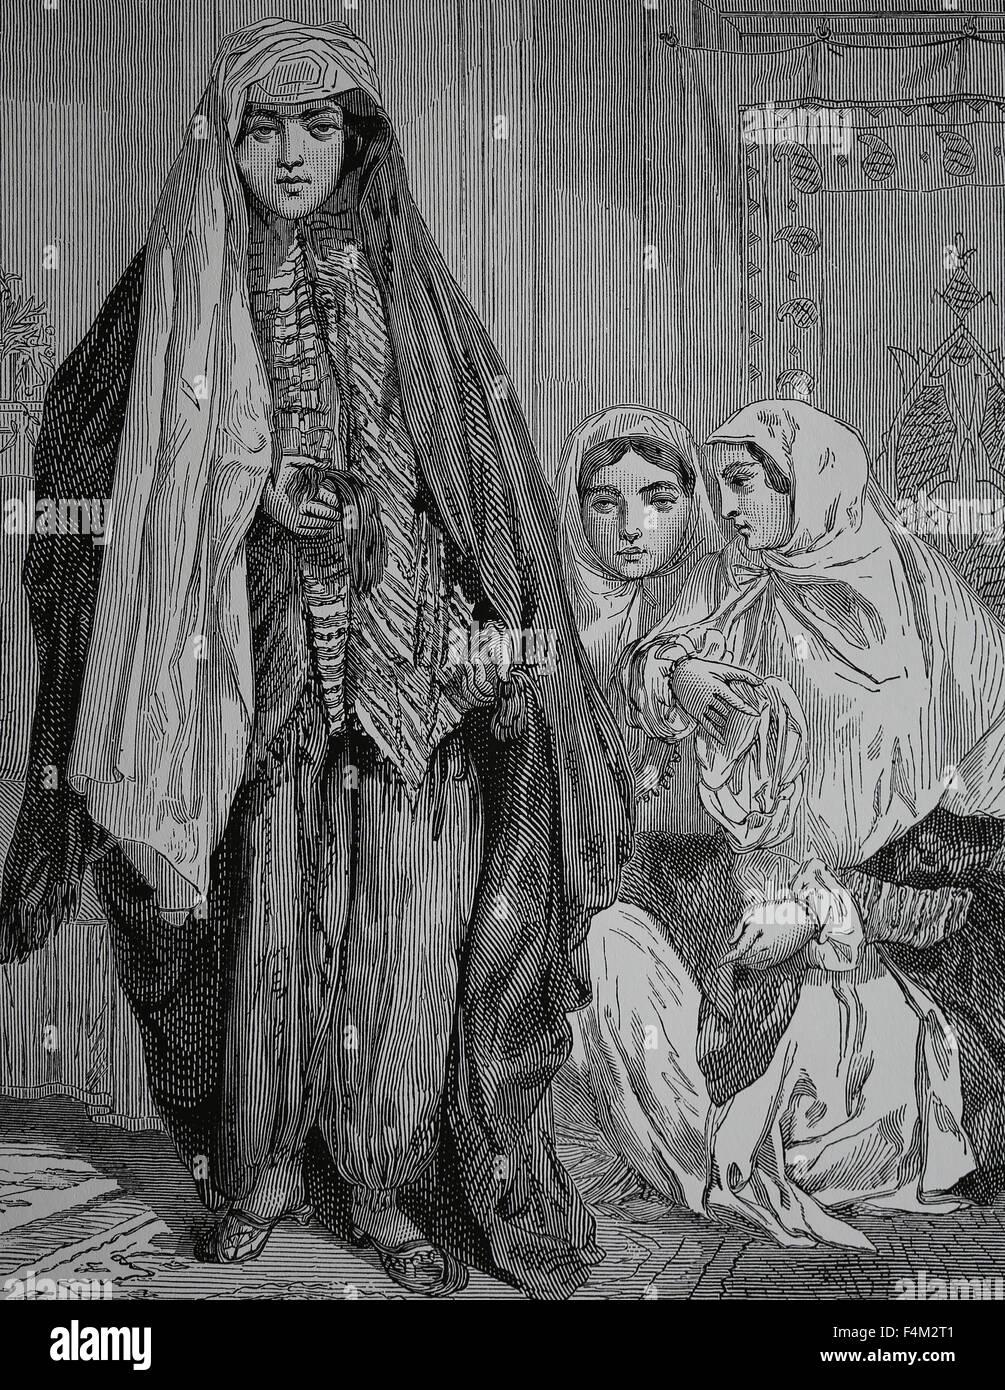 Asia. Persia. Persian ladies, 1880. Engraving, 19th century. - Stock Image